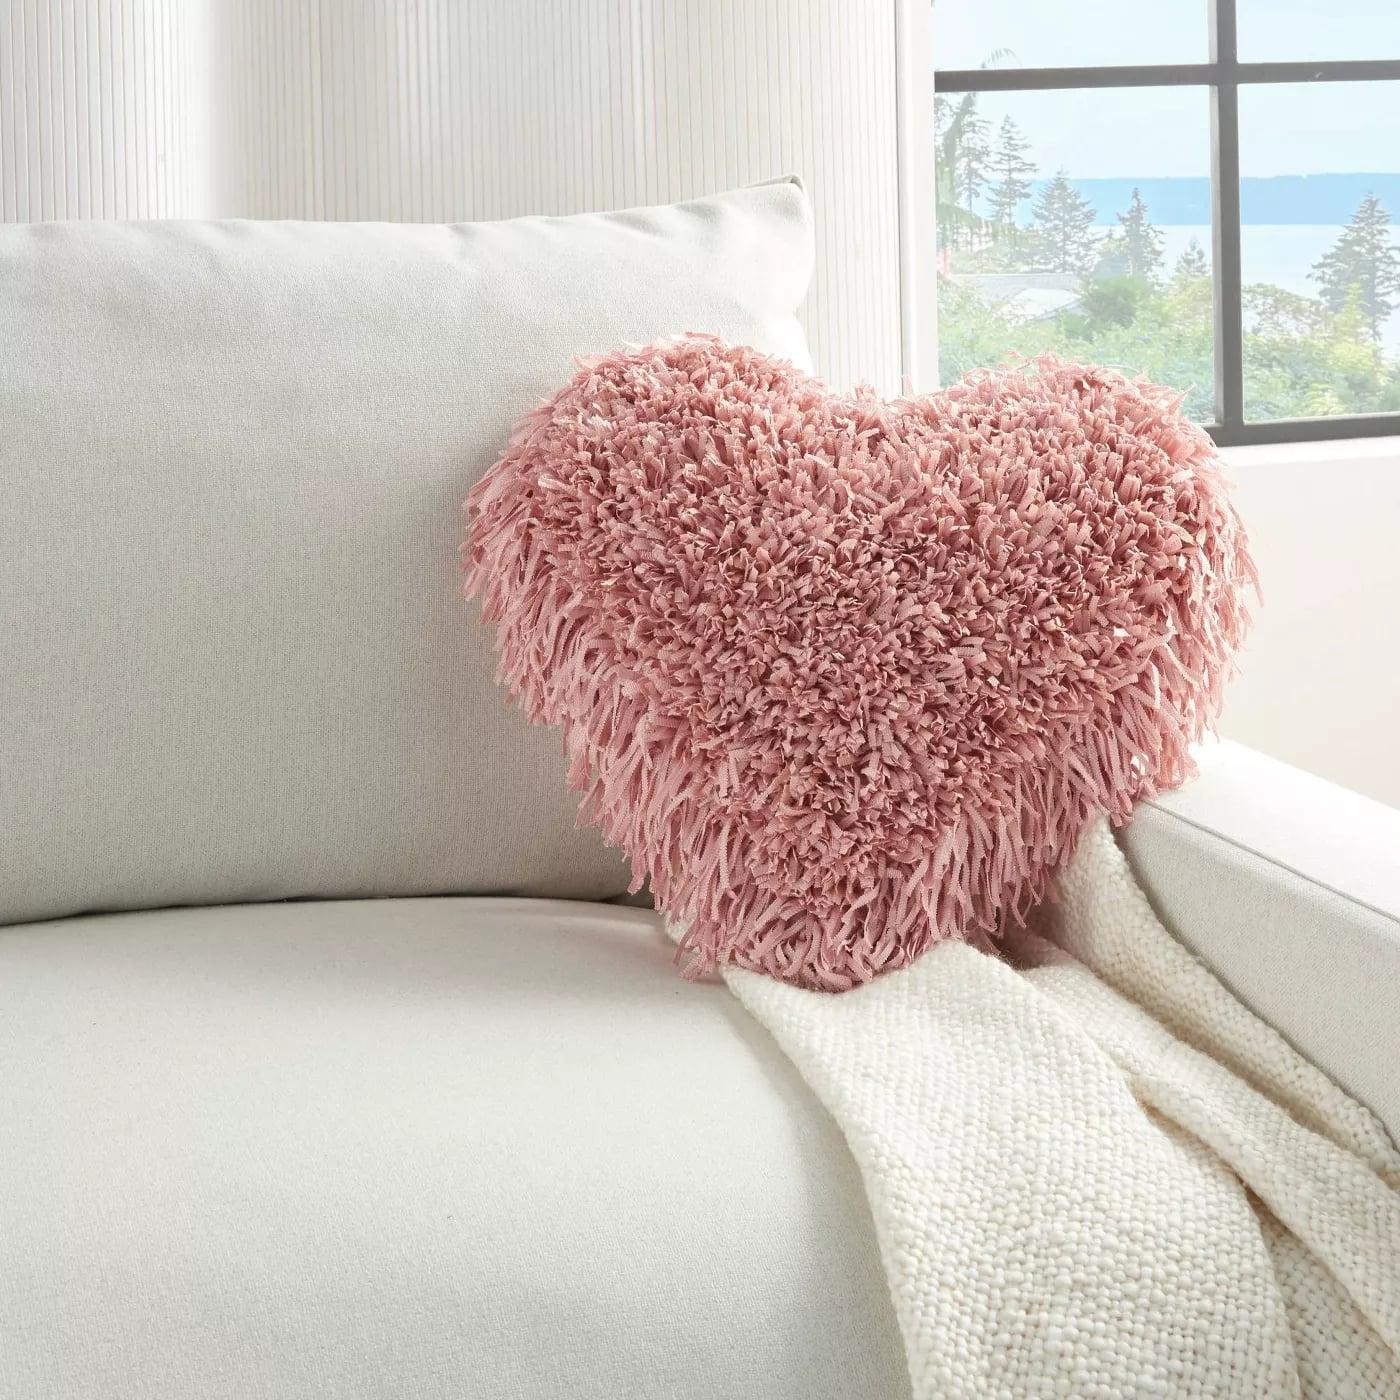 Mina Victory Frame Heart Shag Throw Pillow Shop Target S 2021 Valentine S Day Decorations Popsugar Home Uk Photo 9